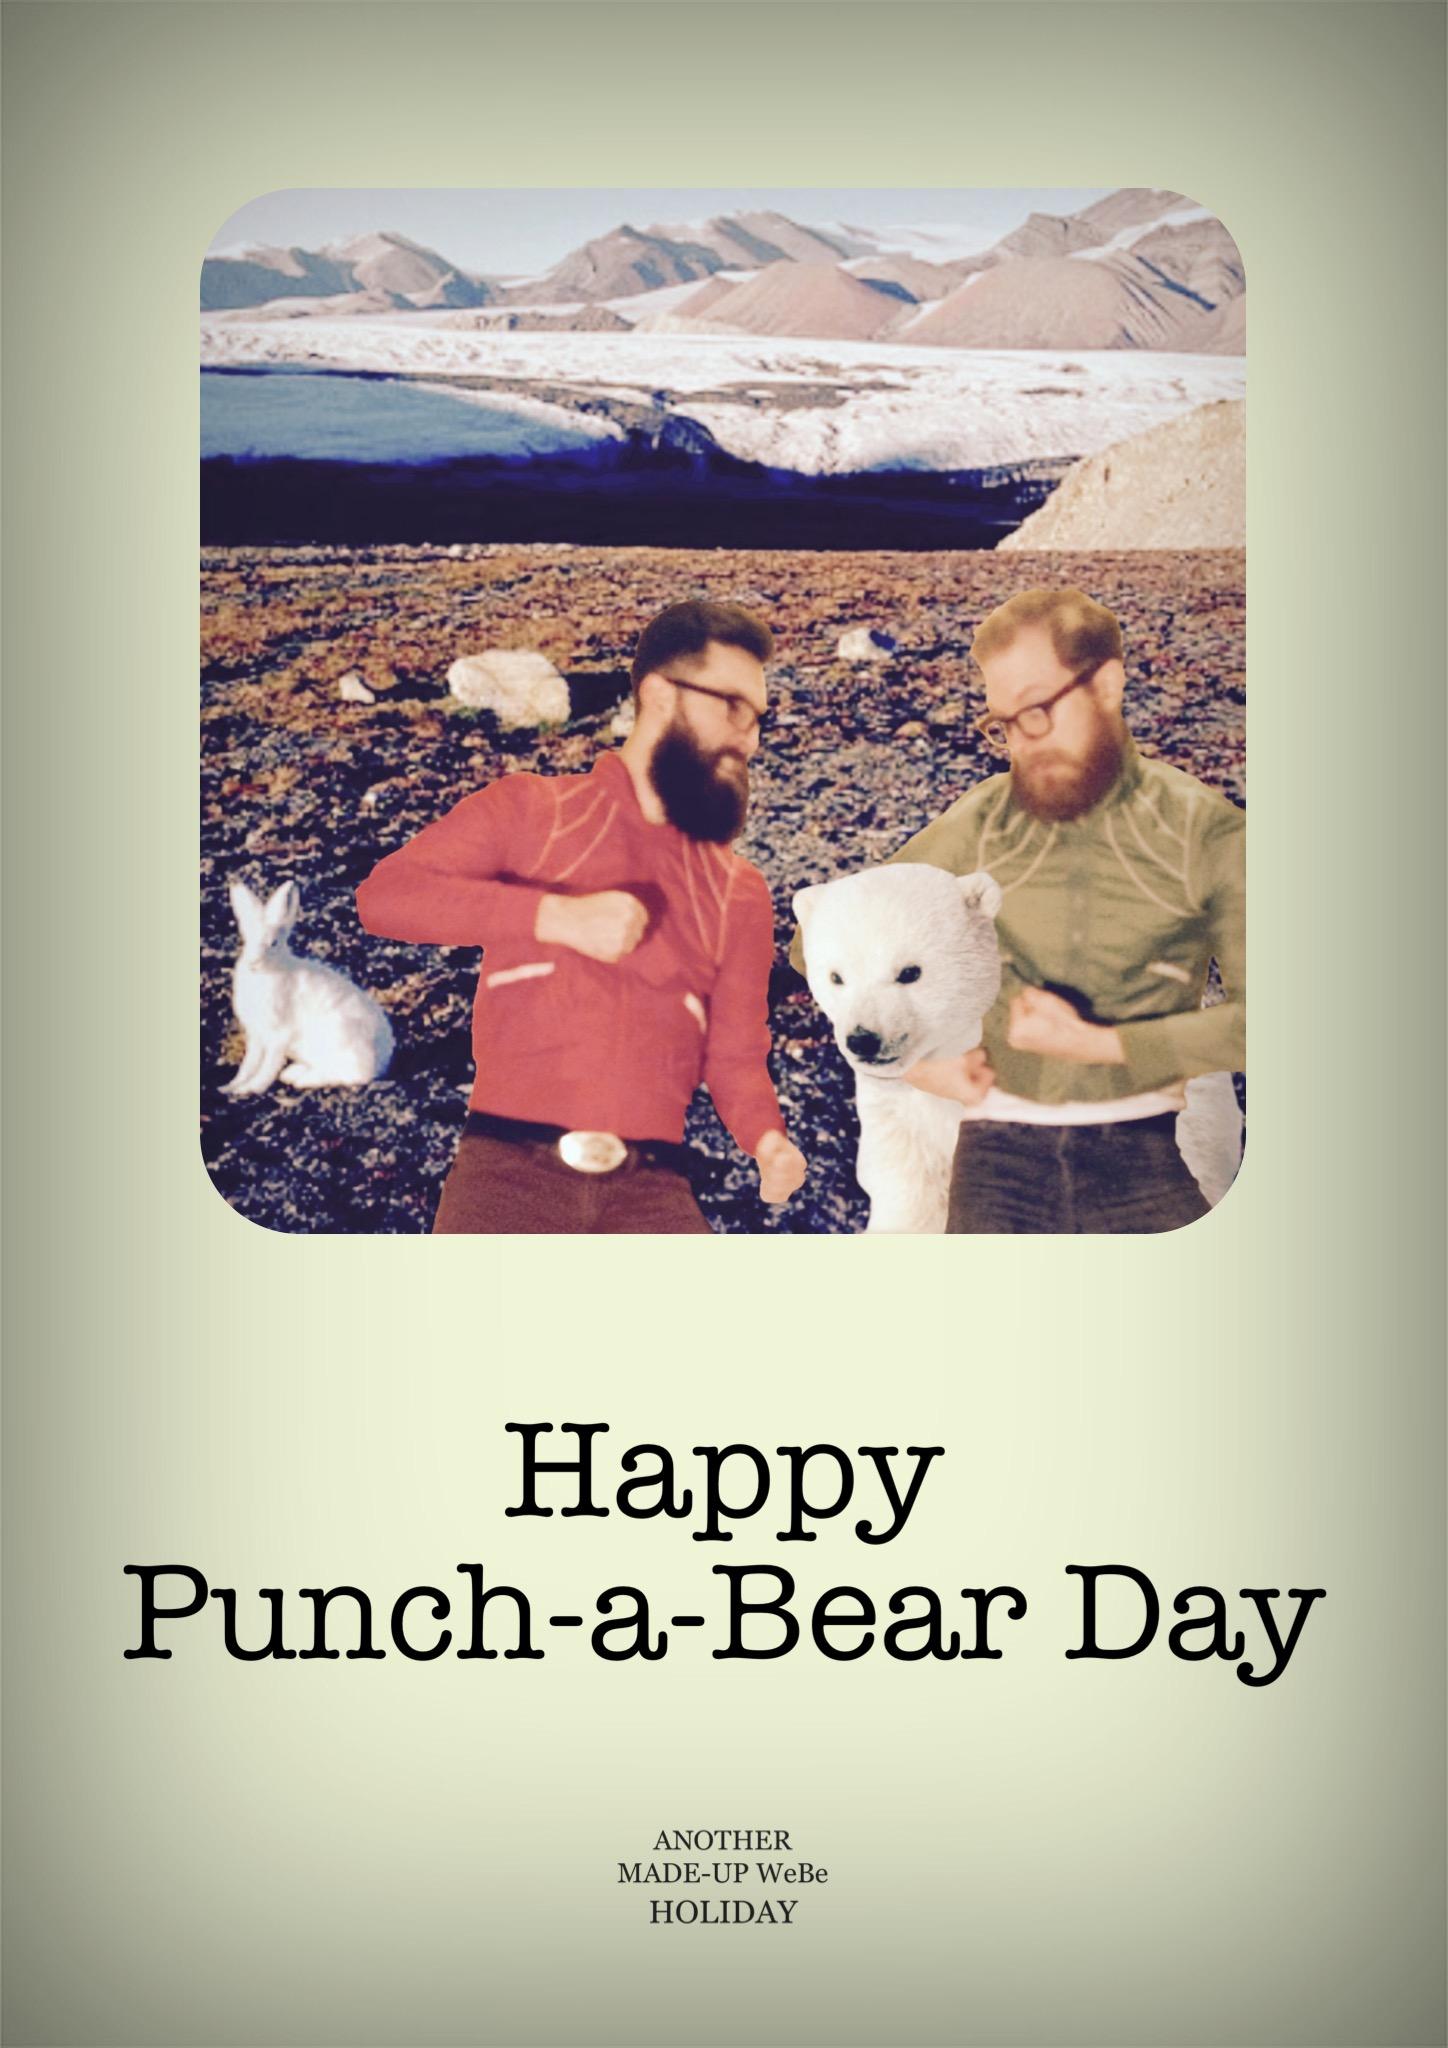 Punch-a-Bear Day 2014 - WeBe 02.jpg